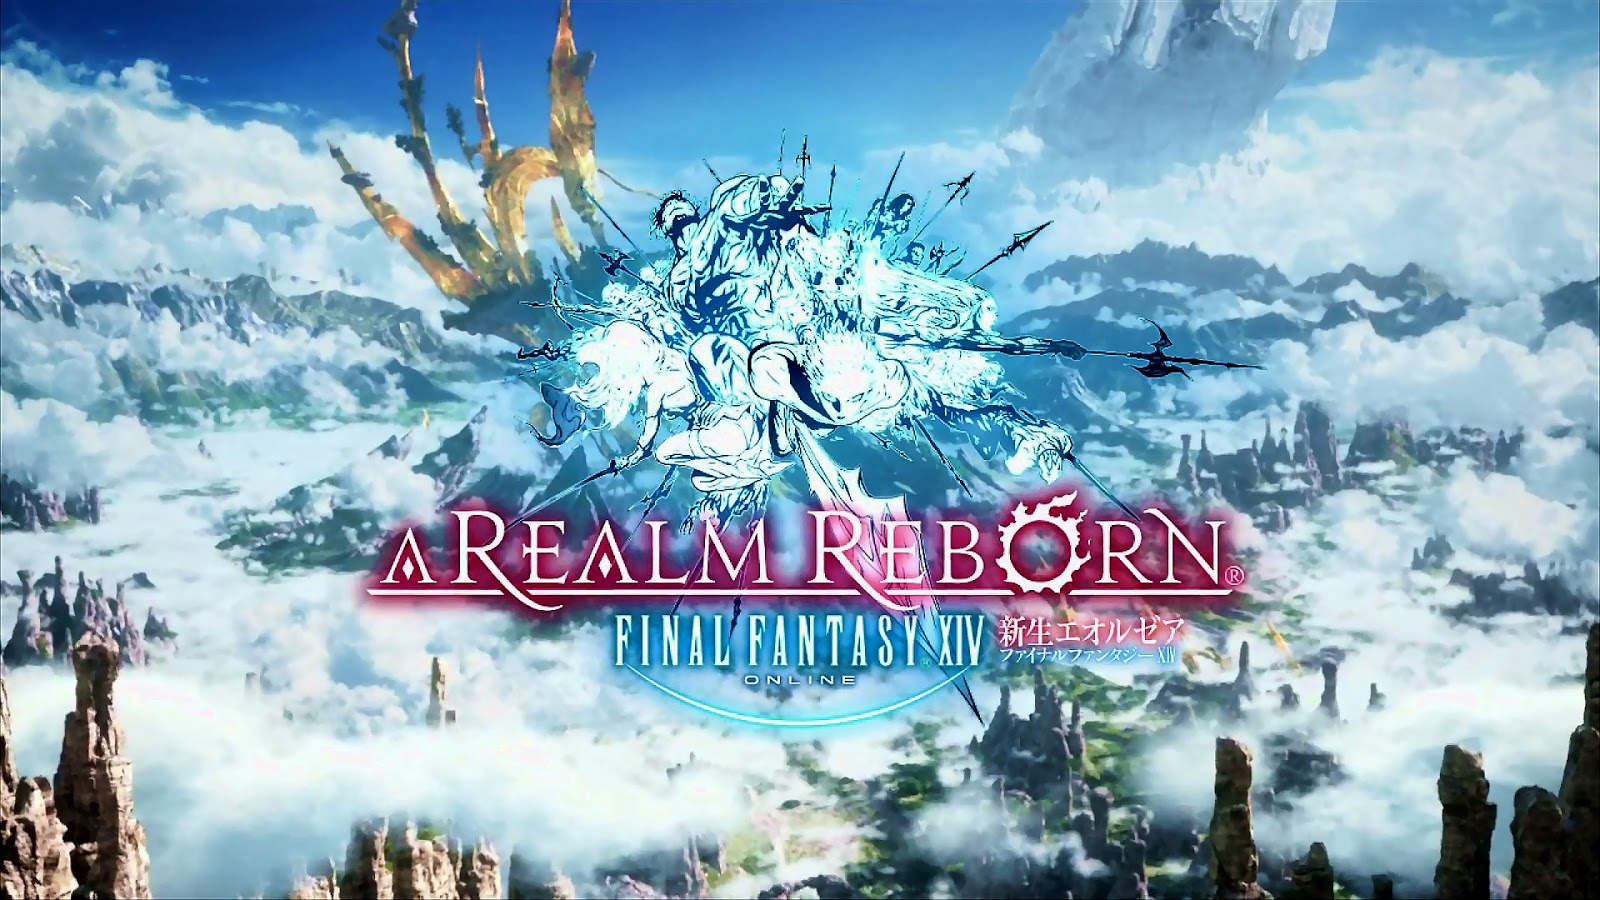 Final-Fantasy-XIV-A-Realm-Reborn-23082013